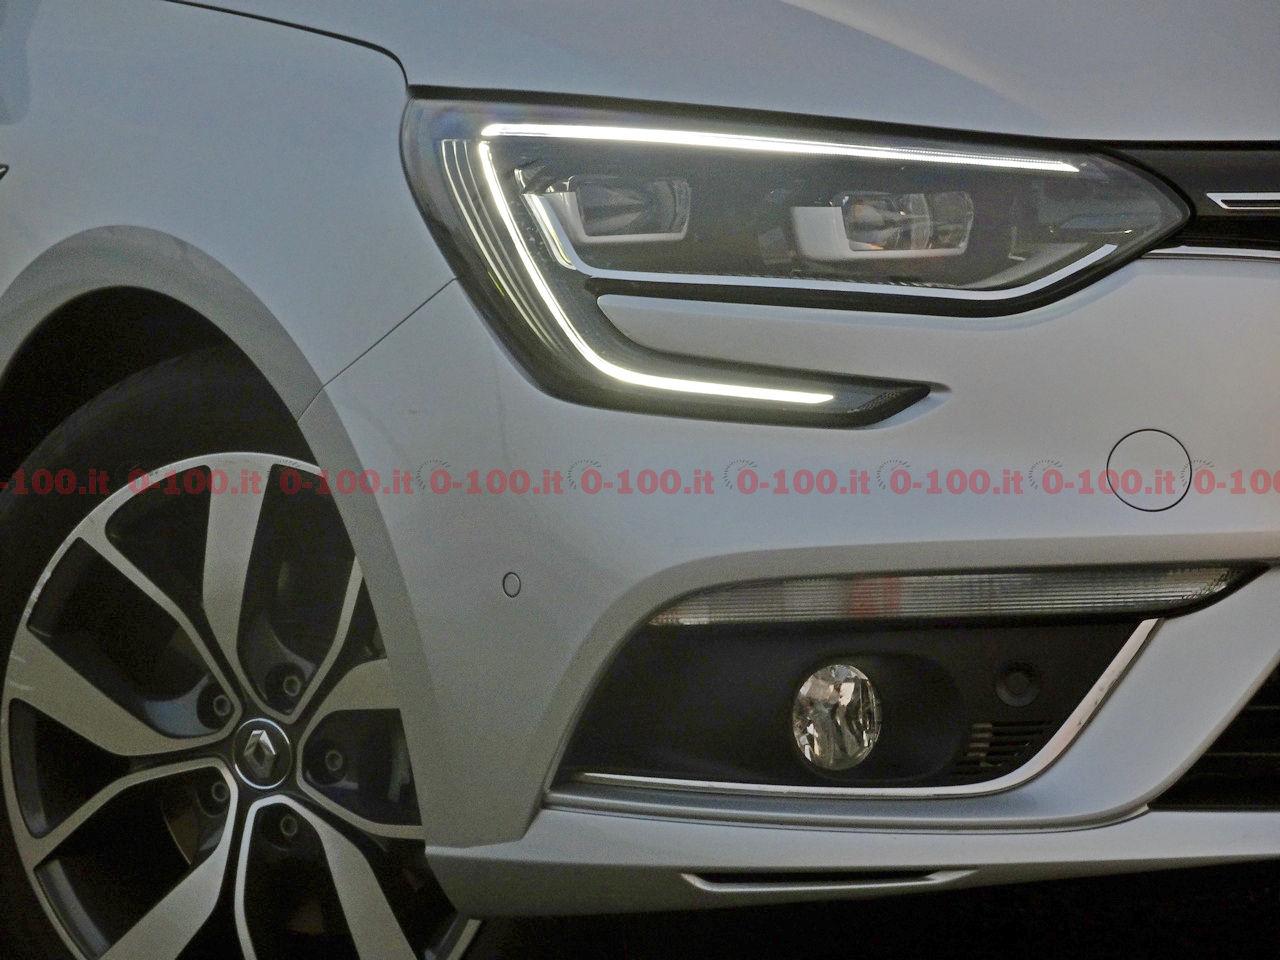 Renault-Megane-GT-Bose-dCi-130-test-prova-opinioni_0-100_11